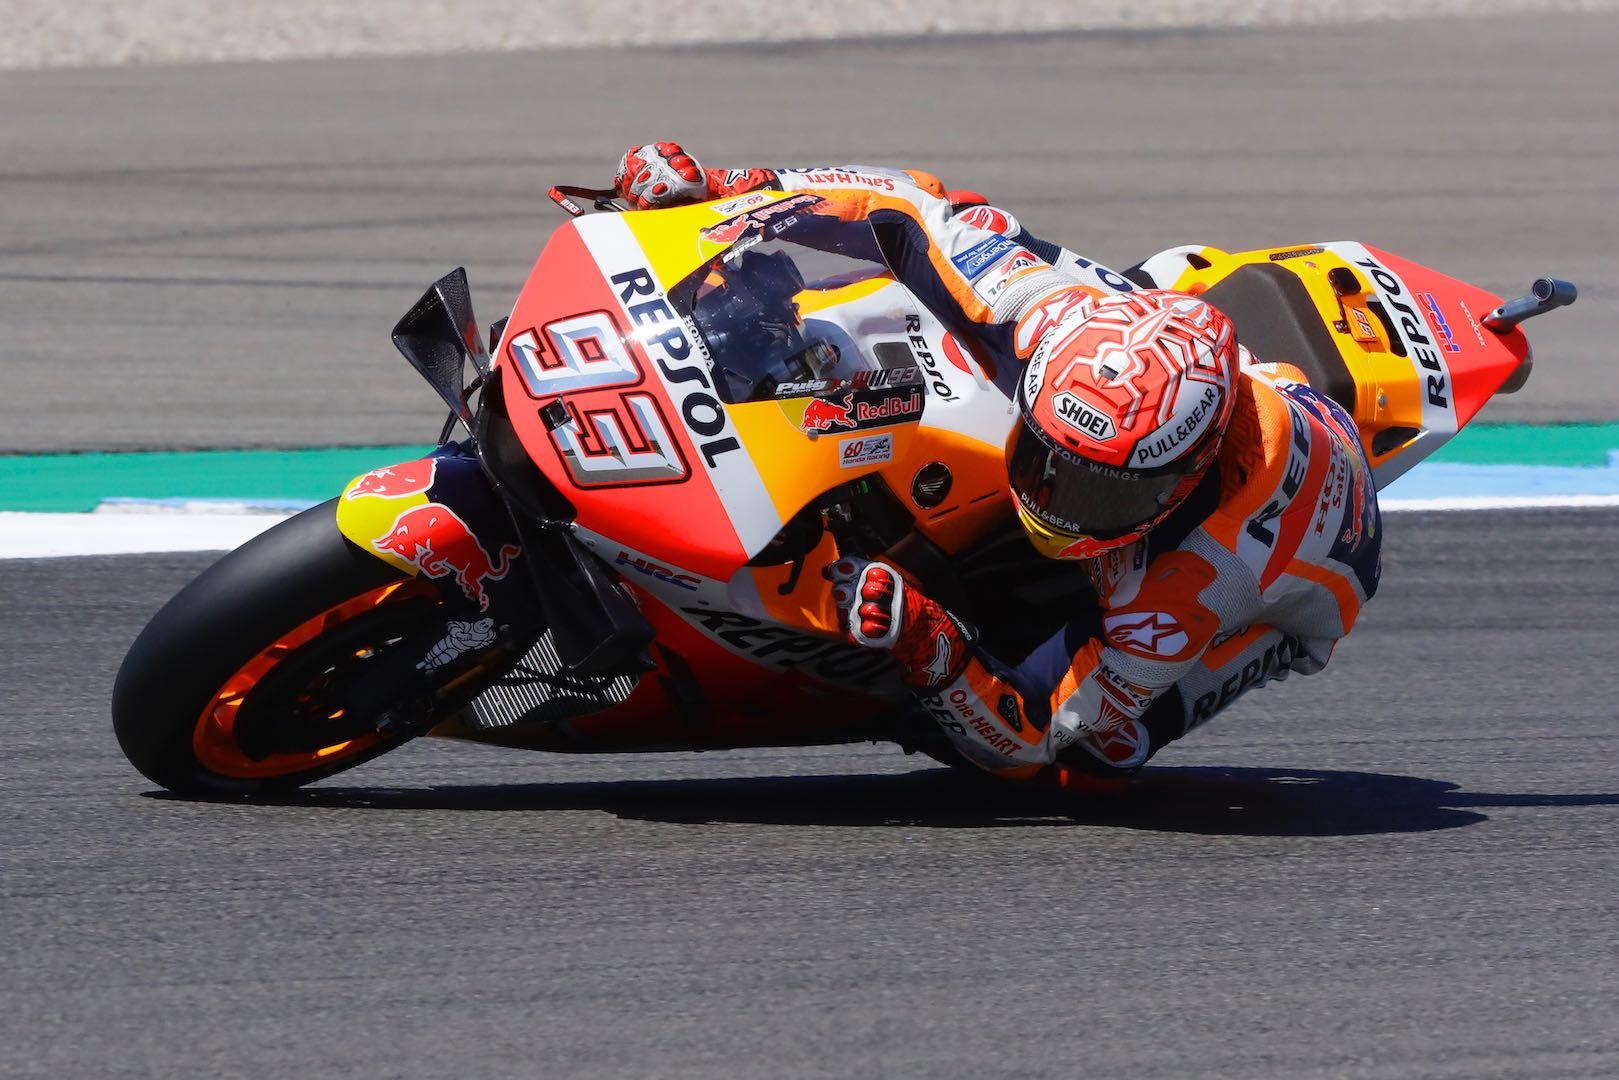 Marquez Honda MotoGP Assen 2019